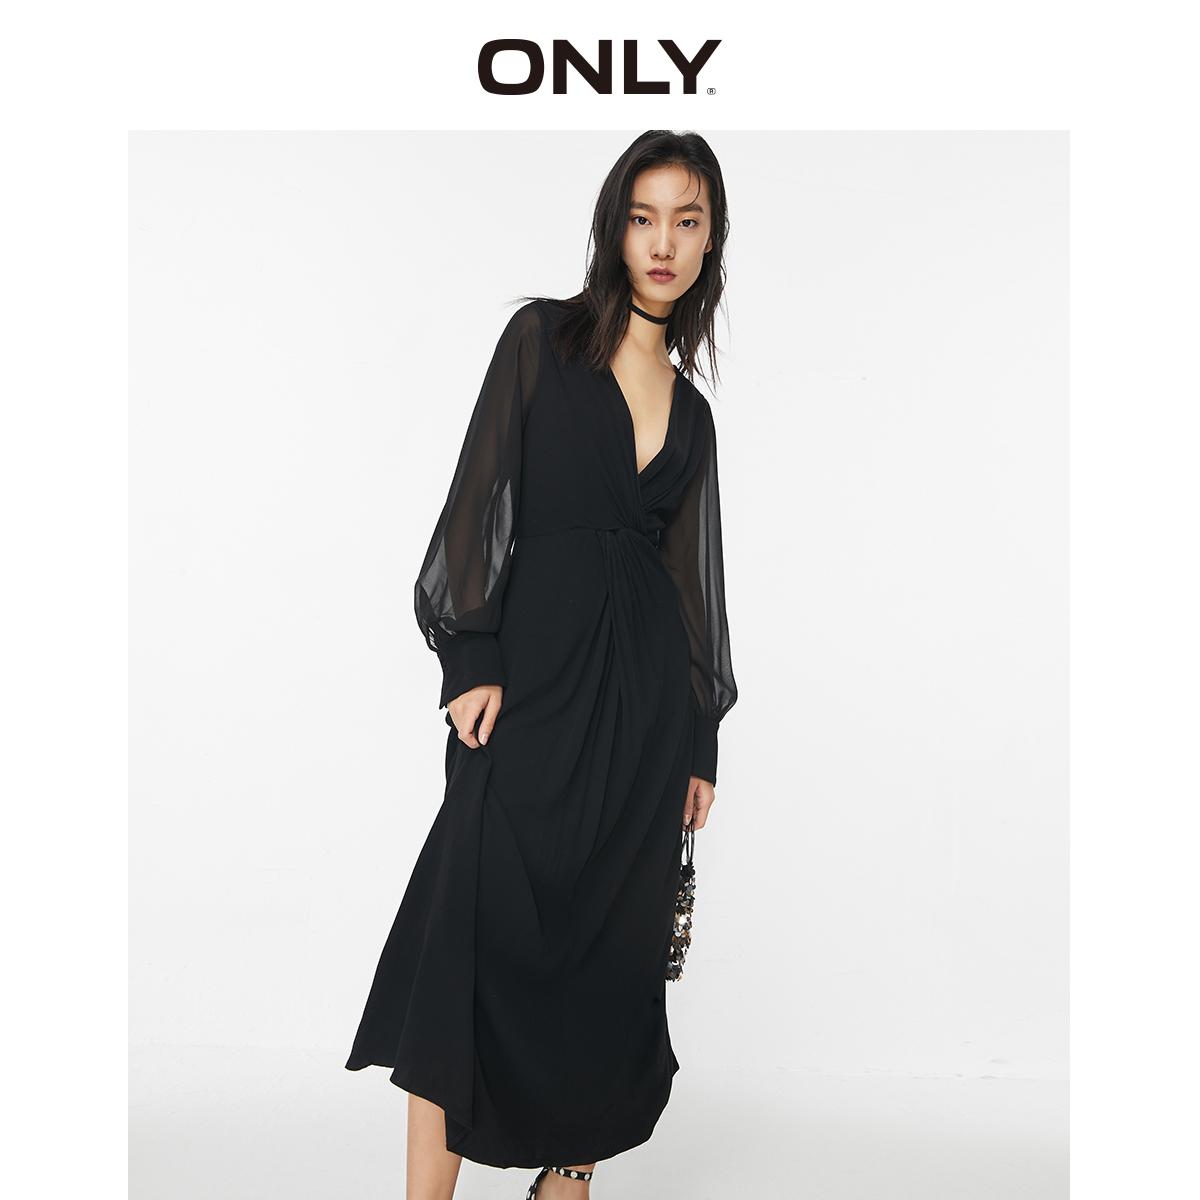 ONLY2020夏季新款气质V领收腰洋气长袖雪纺连衣裙女 120107561